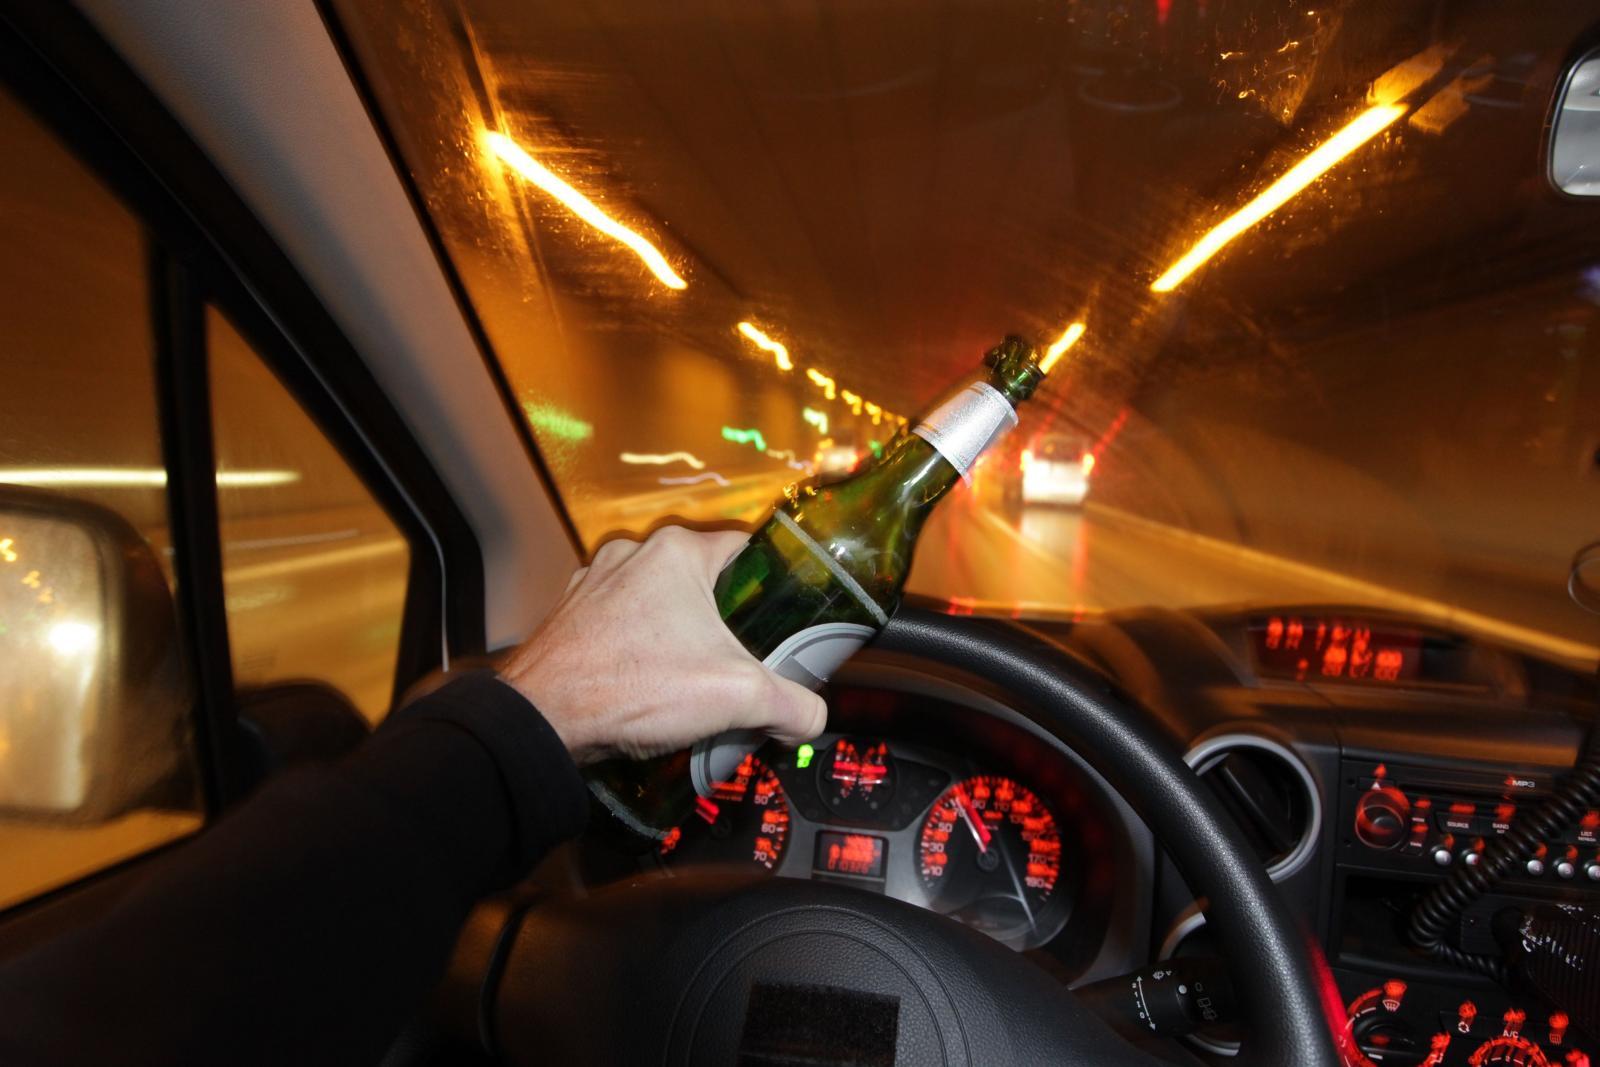 В Брянской области за неделю поймали 31 пьяного водителя